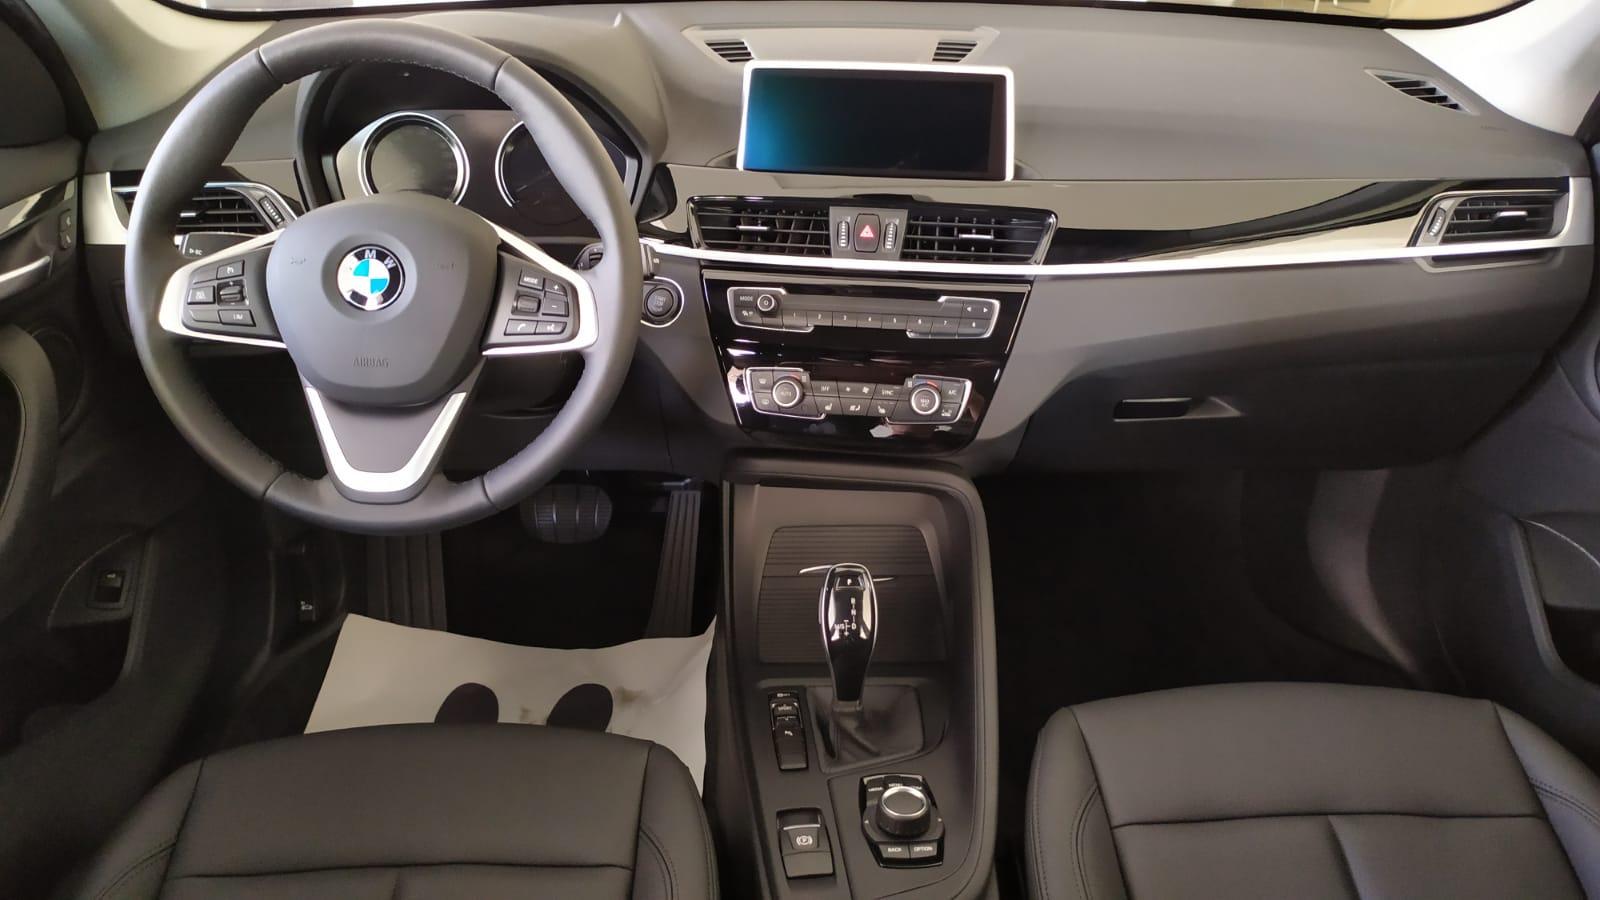 BMW X1 sDrive18i 1.5 140 л.с. 7-Steptronic. SE. Белоснежный. 2021